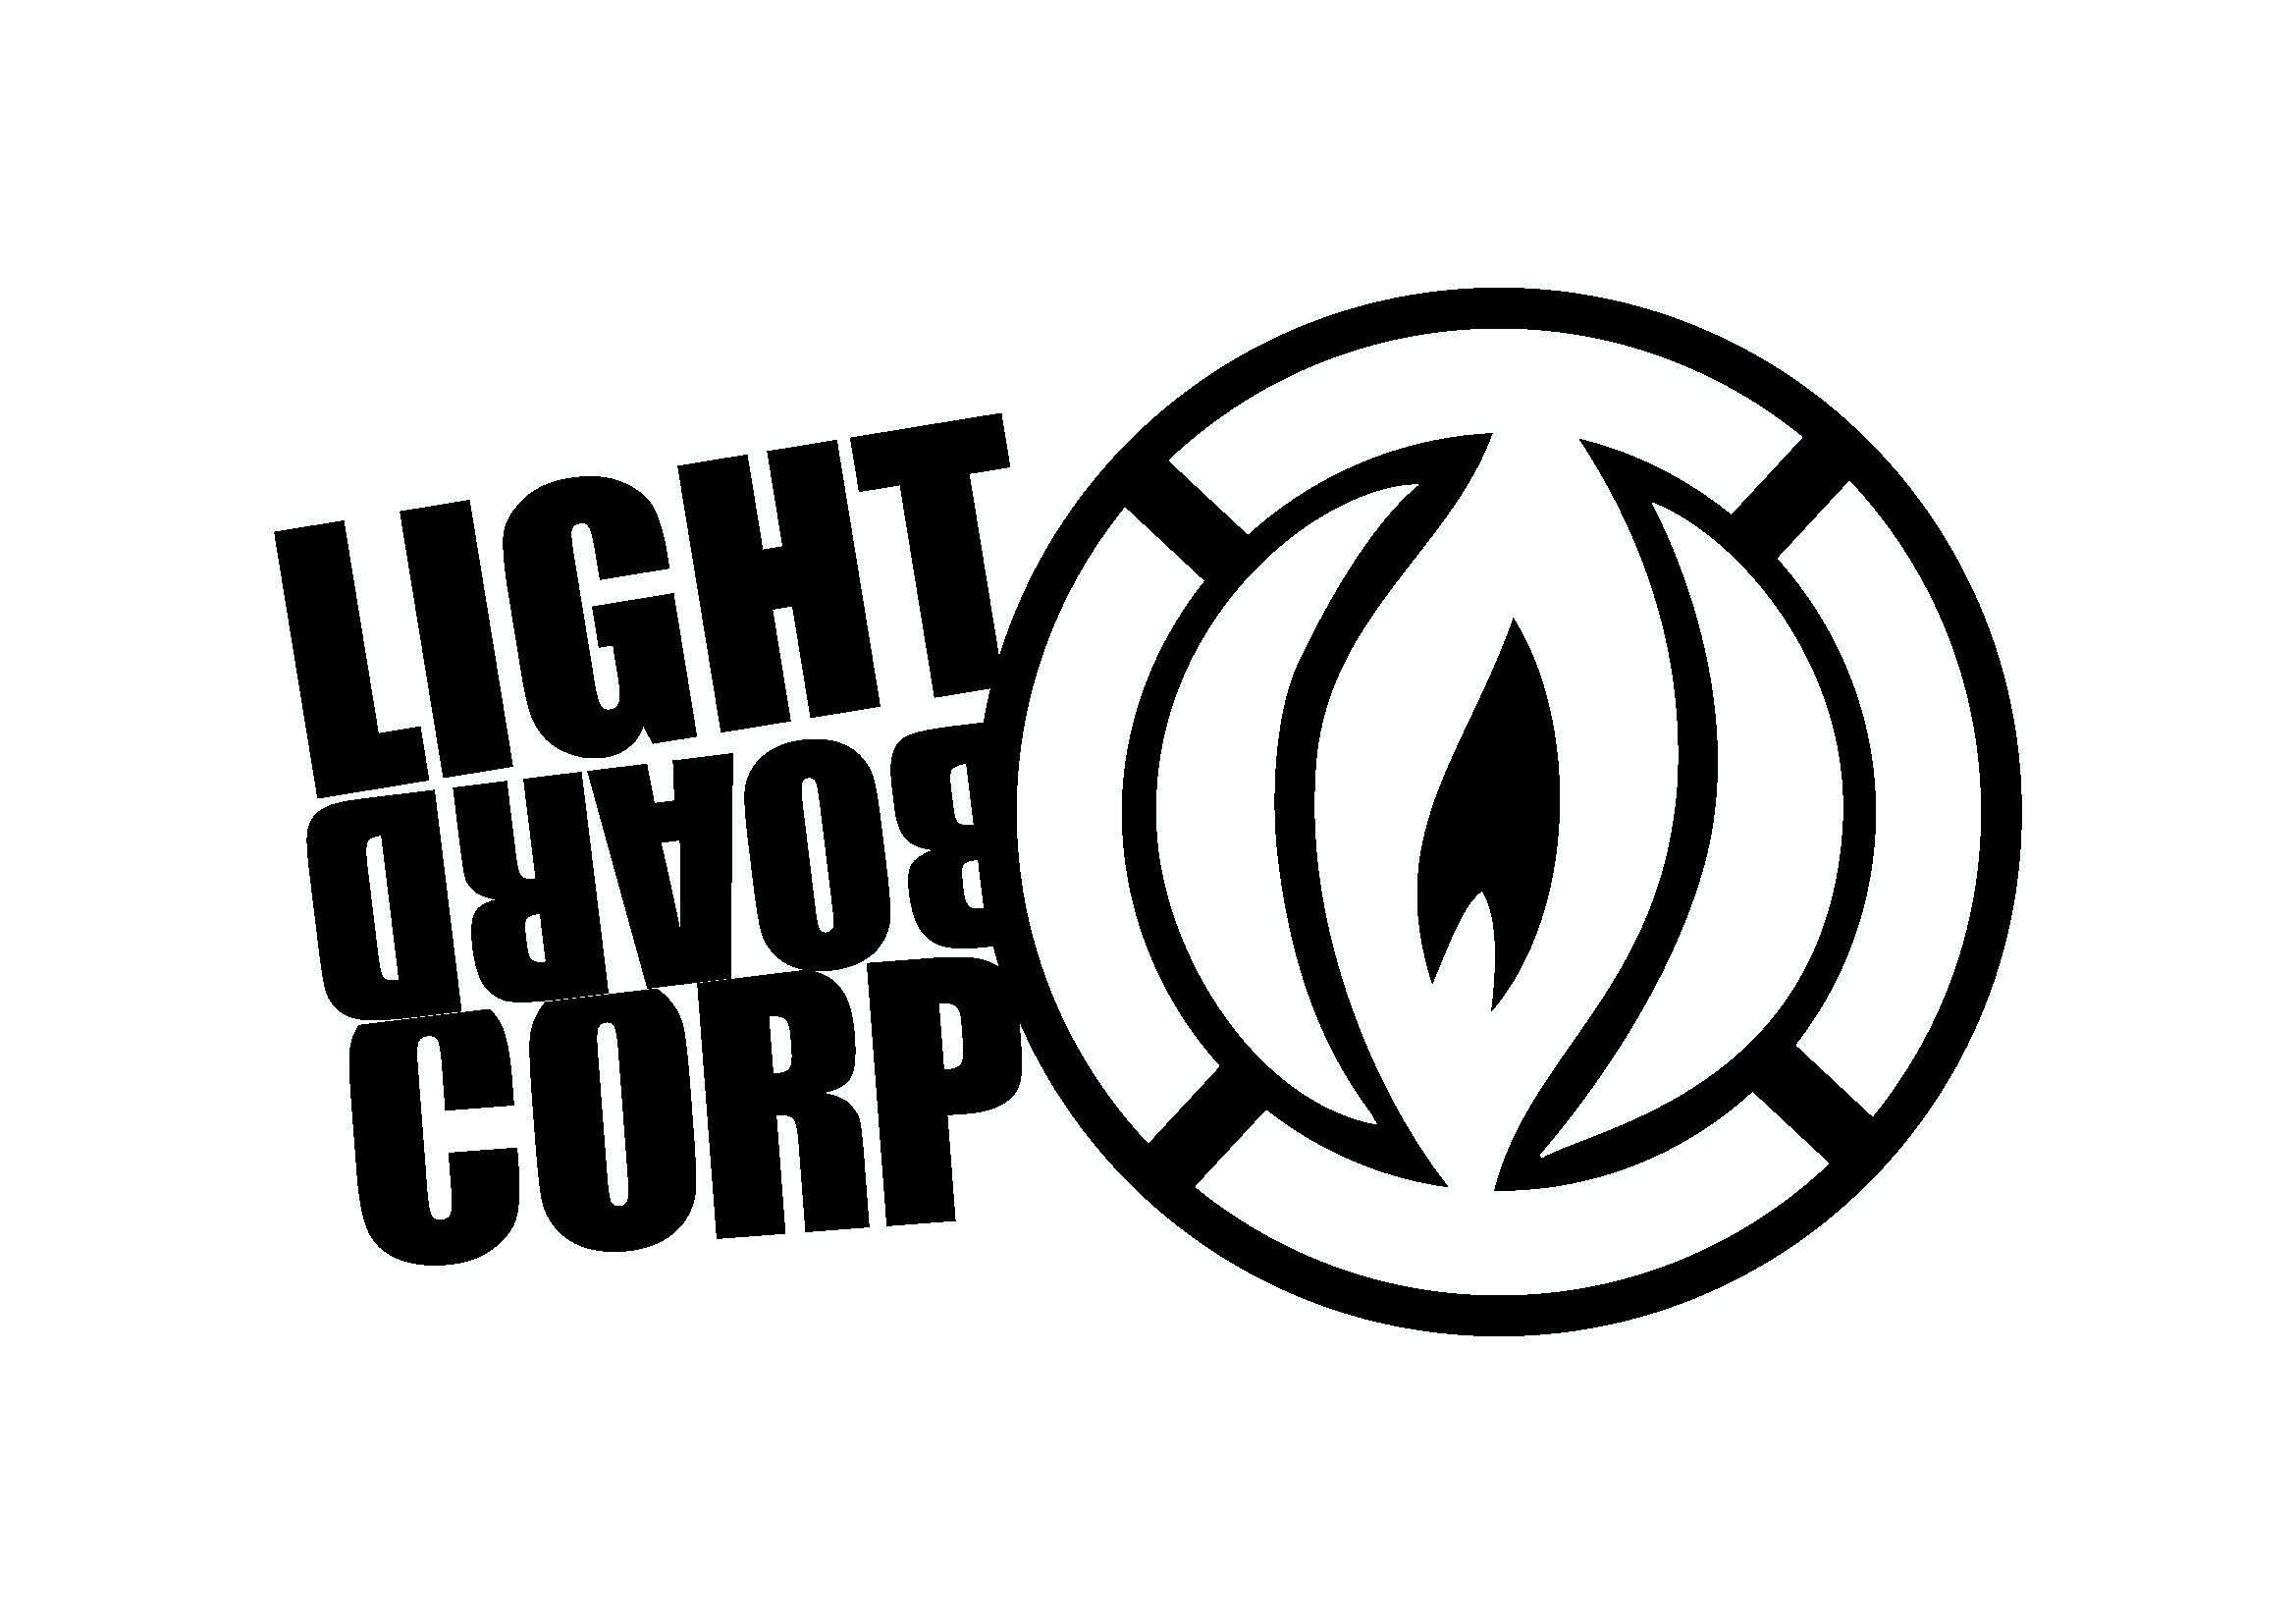 Lightboard Corp SUP logo